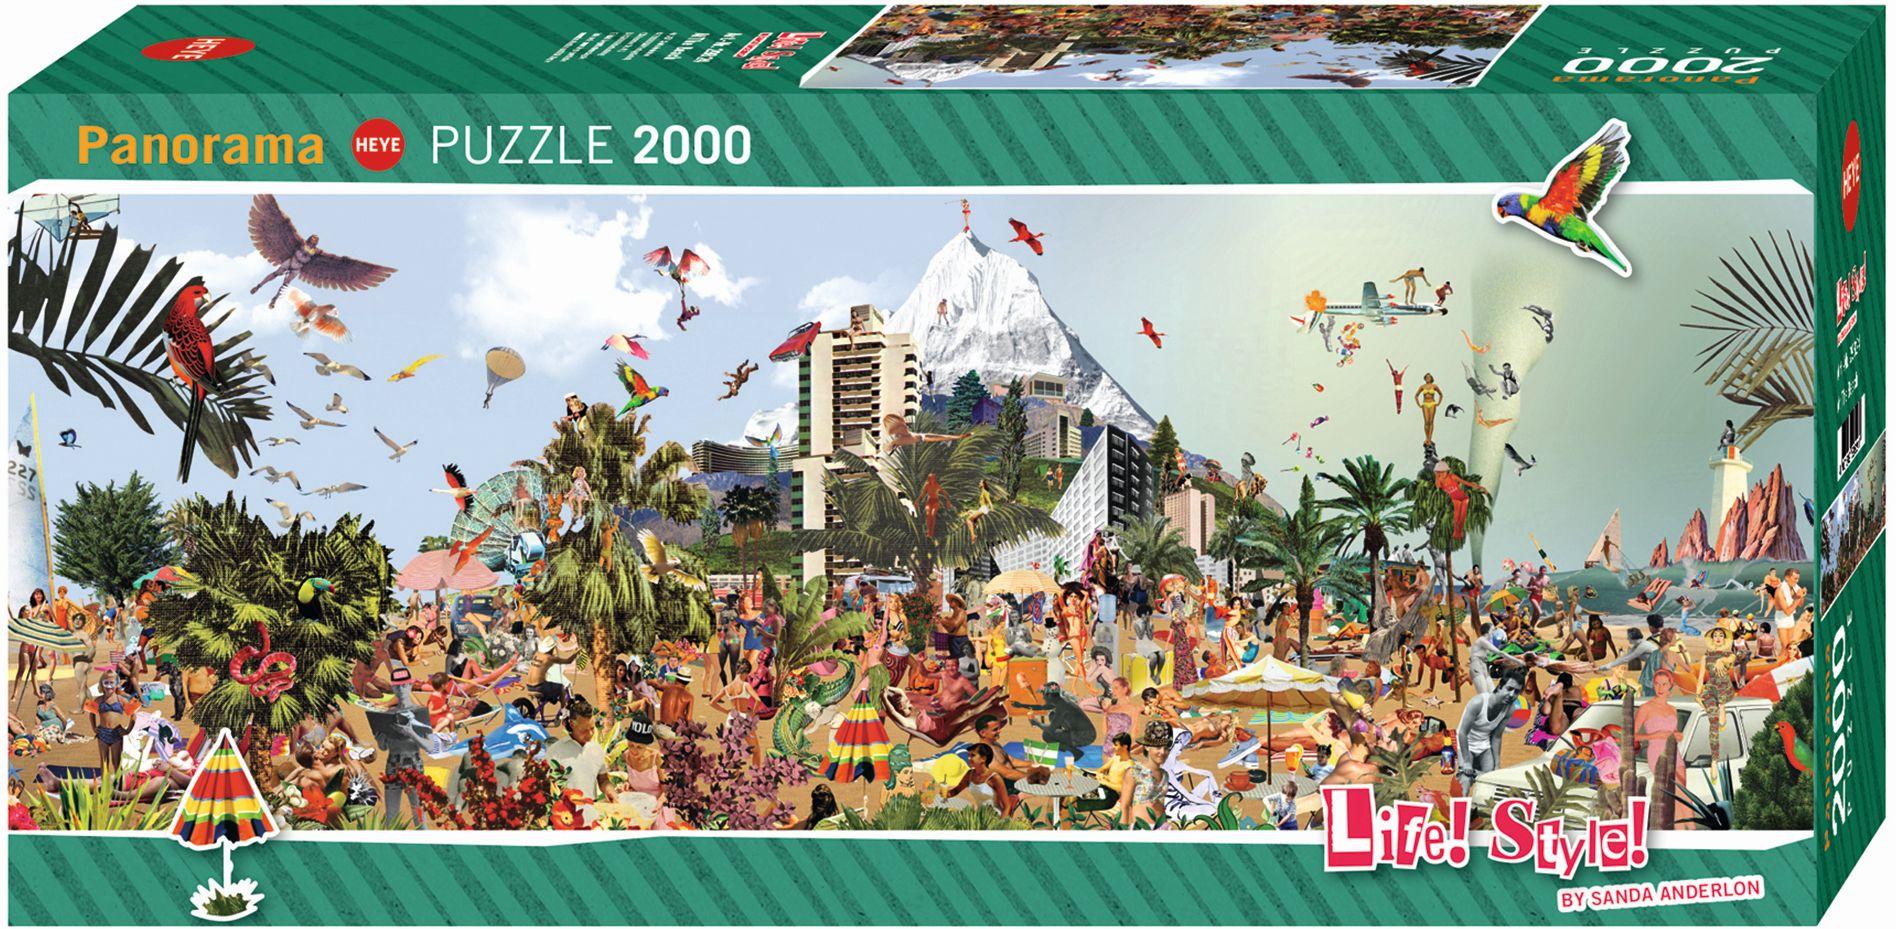 At The Beach Puzzle 2000 Teile als sonstige Artikel